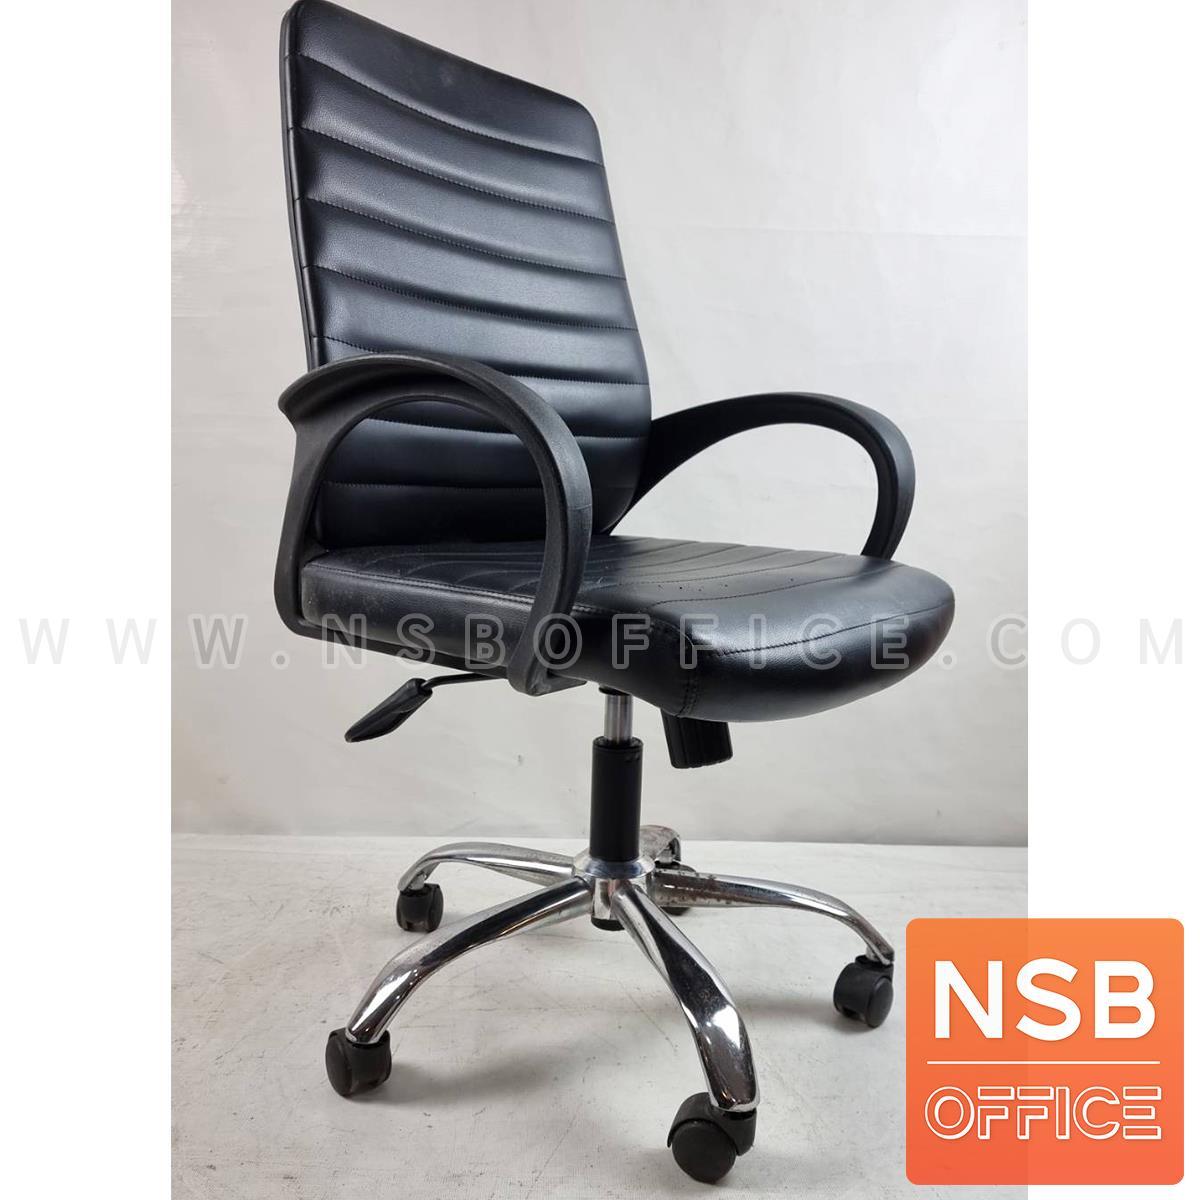 B26A149:เก้าอี้สำนักงาน รุ่น Romesco (โรเมสโค่)  ขาเหล็กชุบโครเมี่ยม